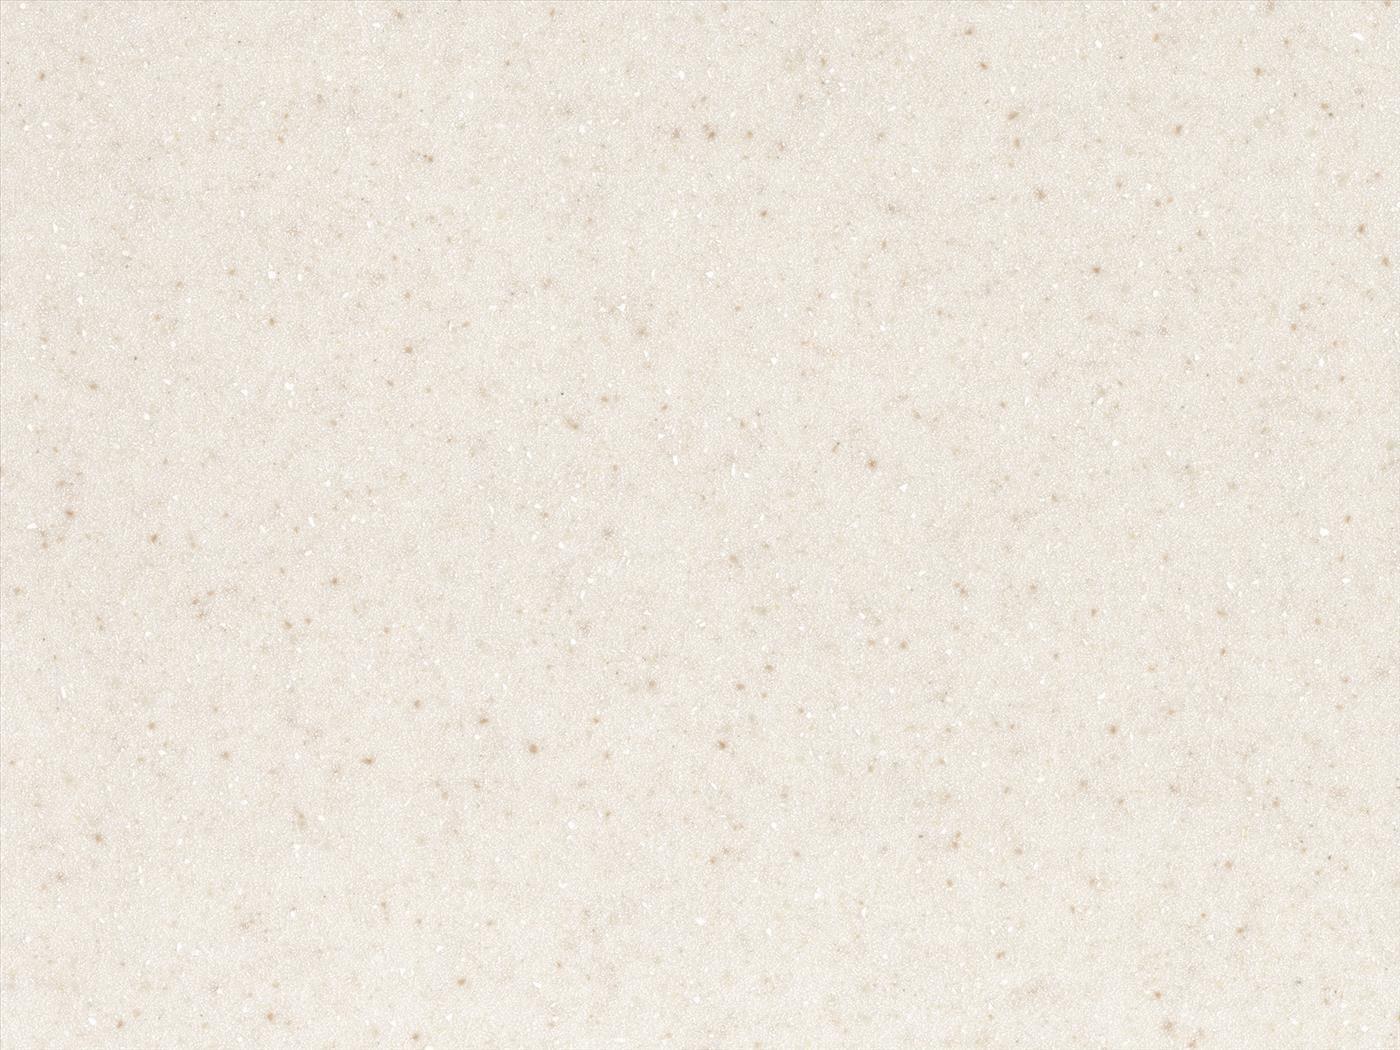 קוריאן corian linen